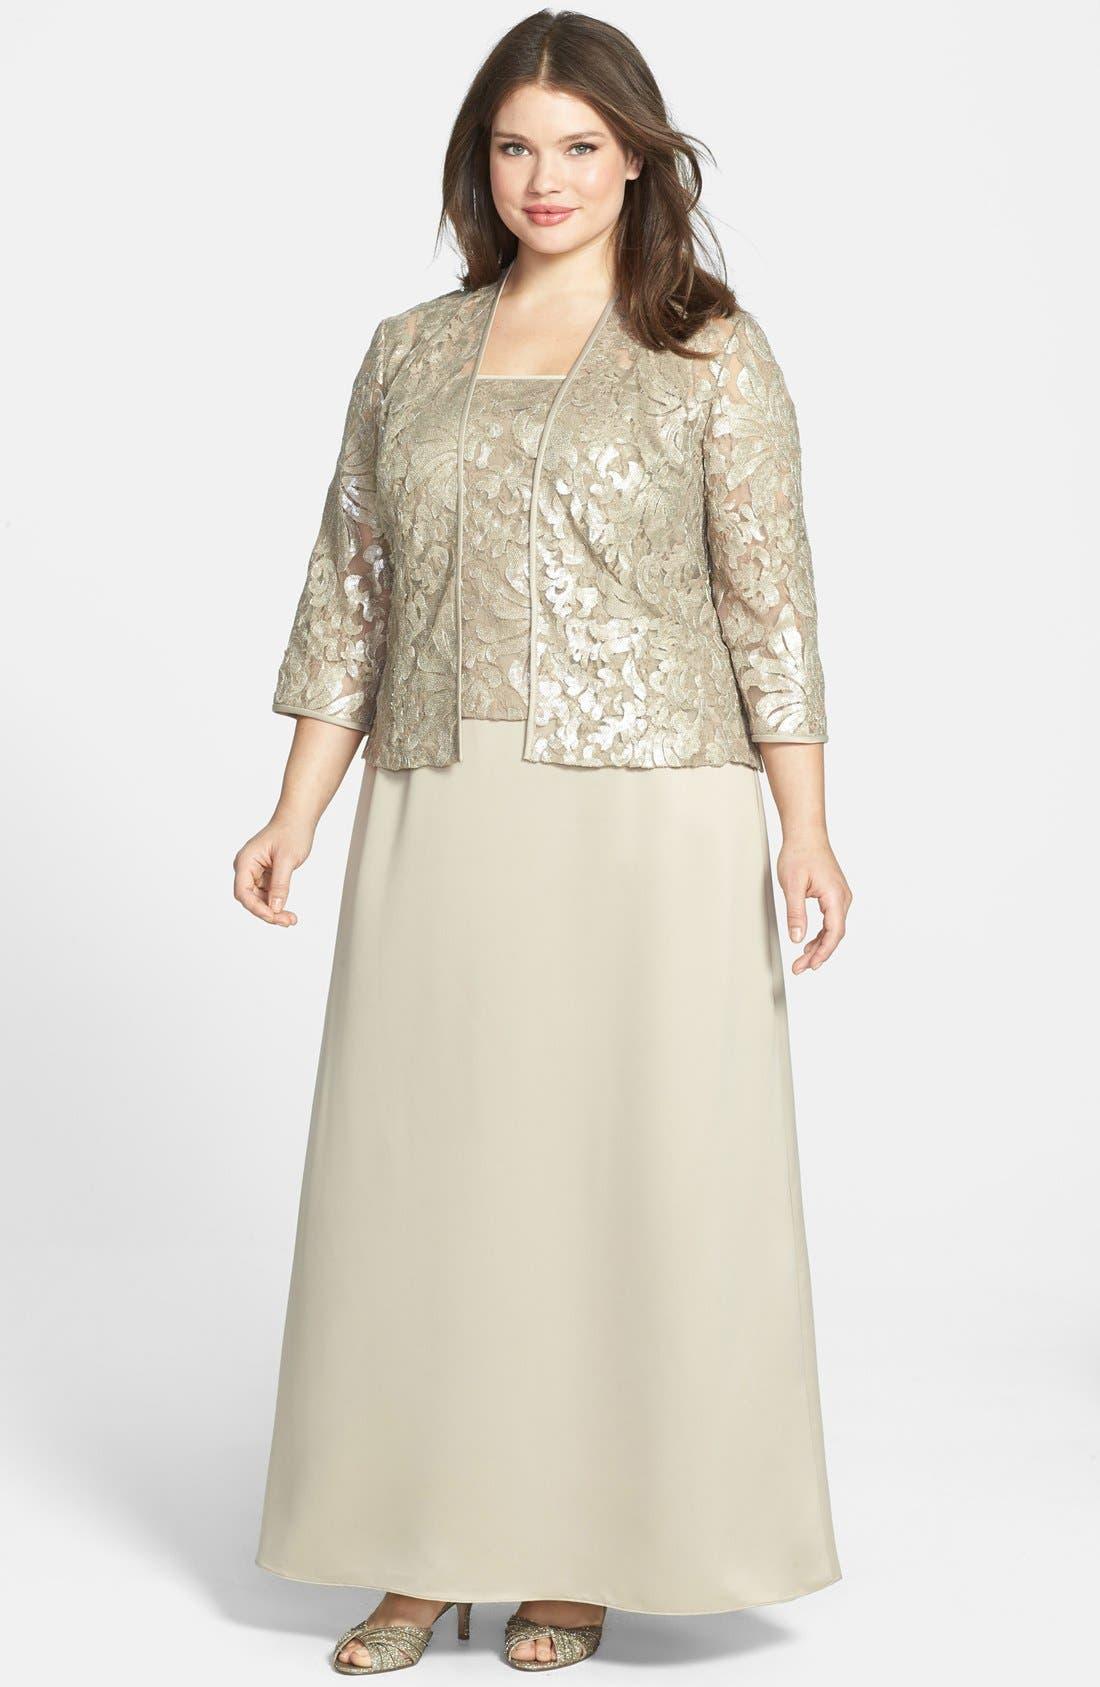 Alternate Image 1 Selected - Alex Evenings Embellished Chiffon Gown & Jacket (Plus Size)